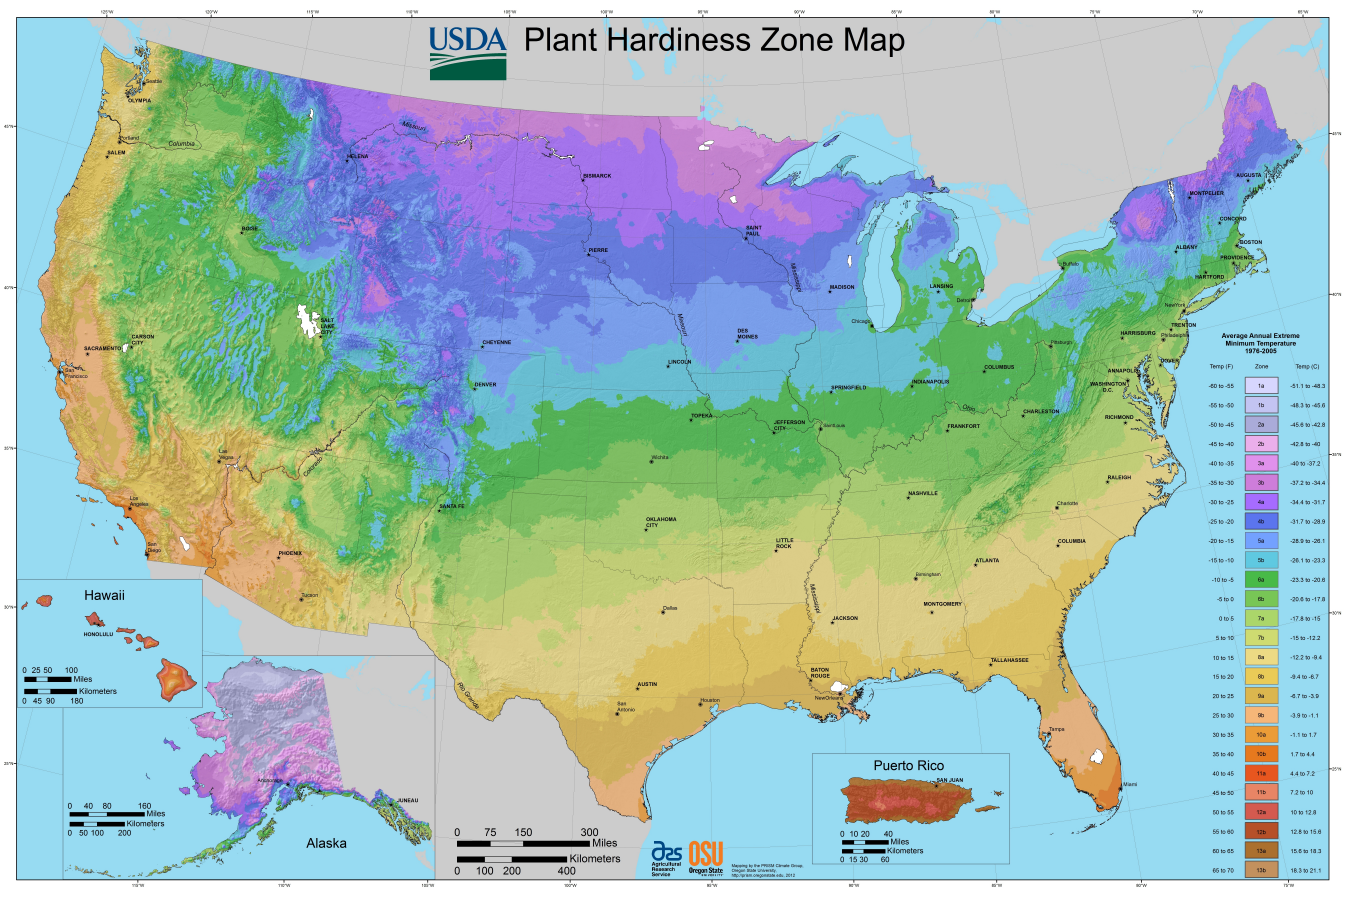 usda_plant_hardiness_zones_map-smaller